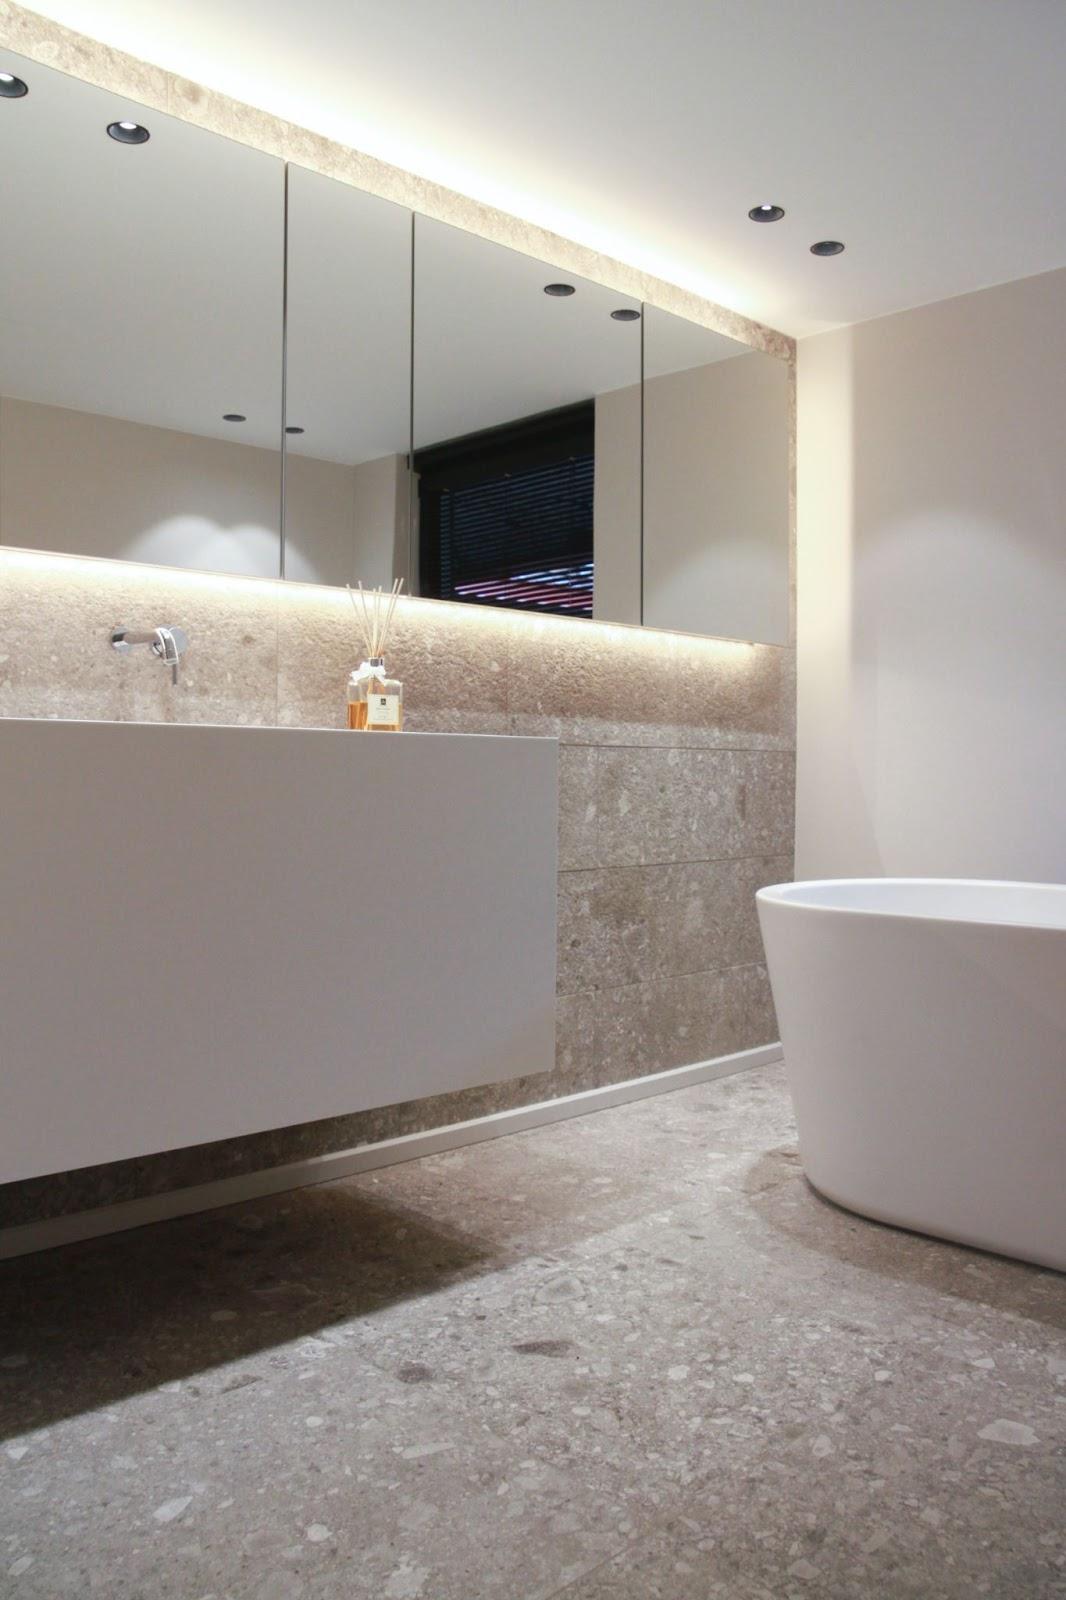 Design Tips Using bathroom mirrors